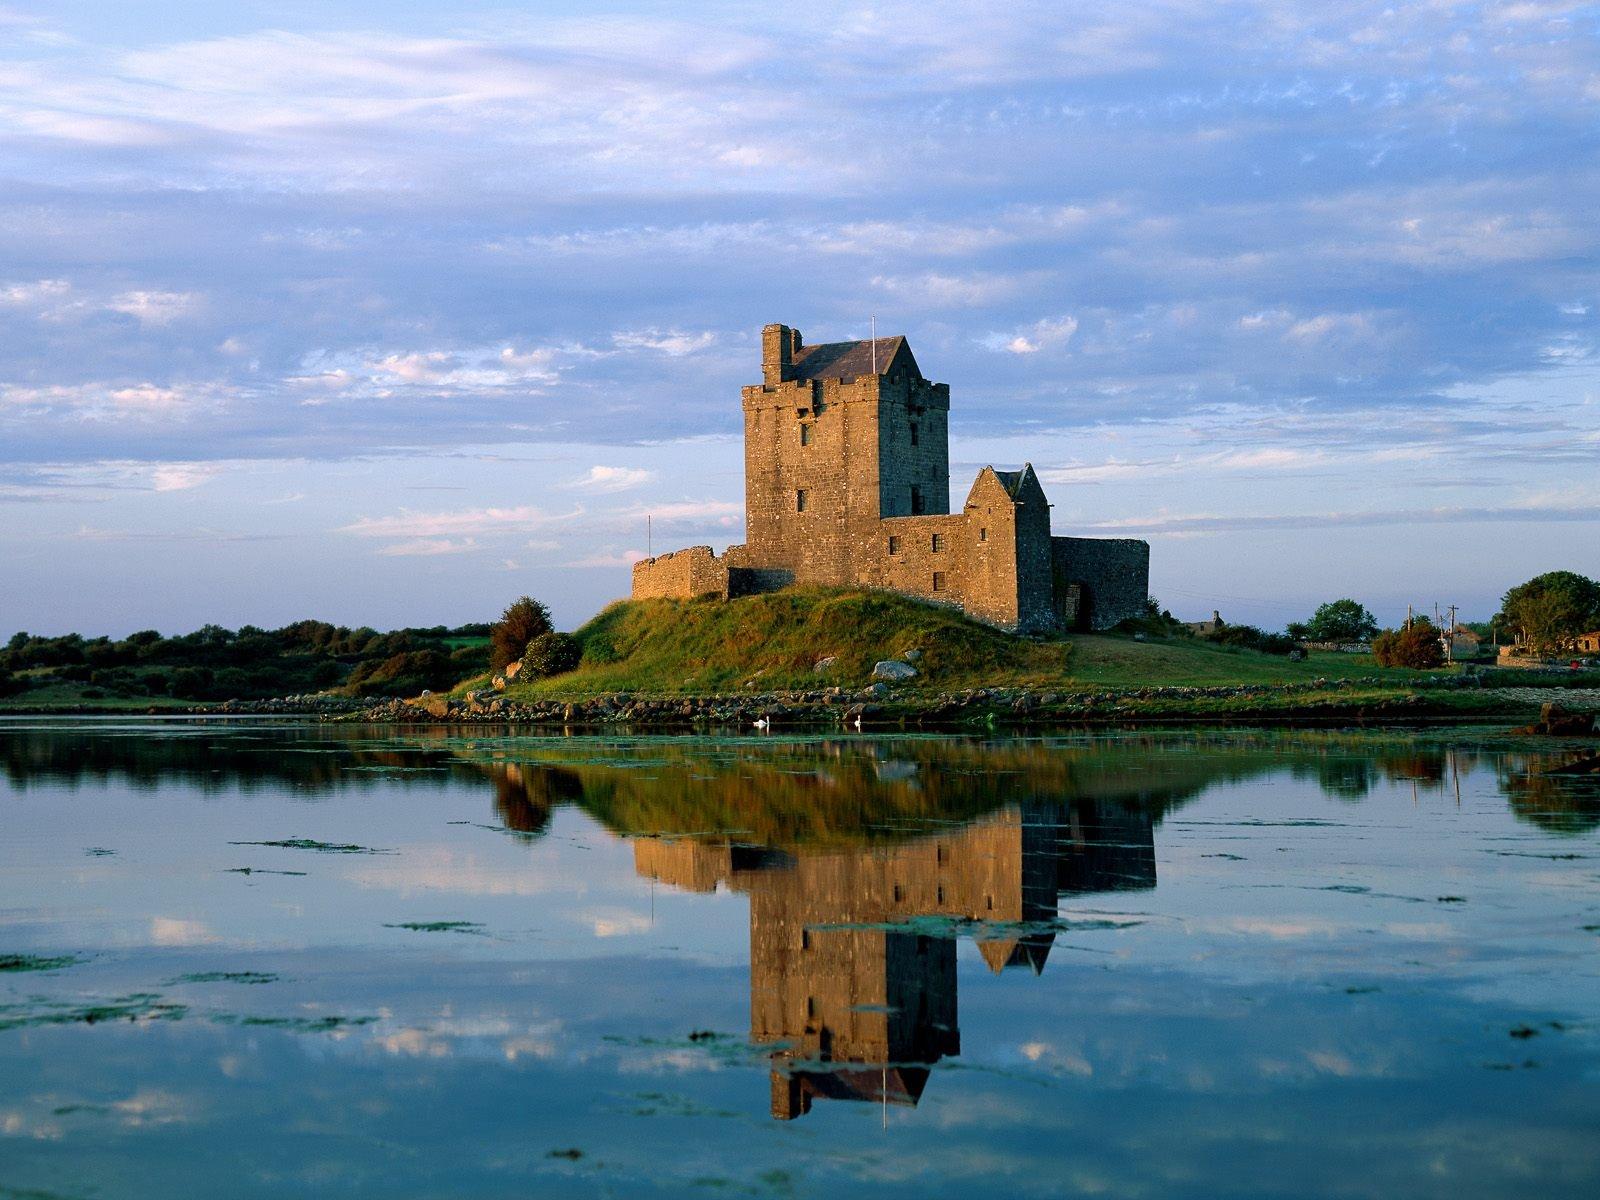 http://4.bp.blogspot.com/-bsSgJbZ_Q1I/SVPQXPxqiEI/AAAAAAAAAFc/xy_hppalZ40/s1600/Dunguaire+Castle%252C+Ireland.jpg